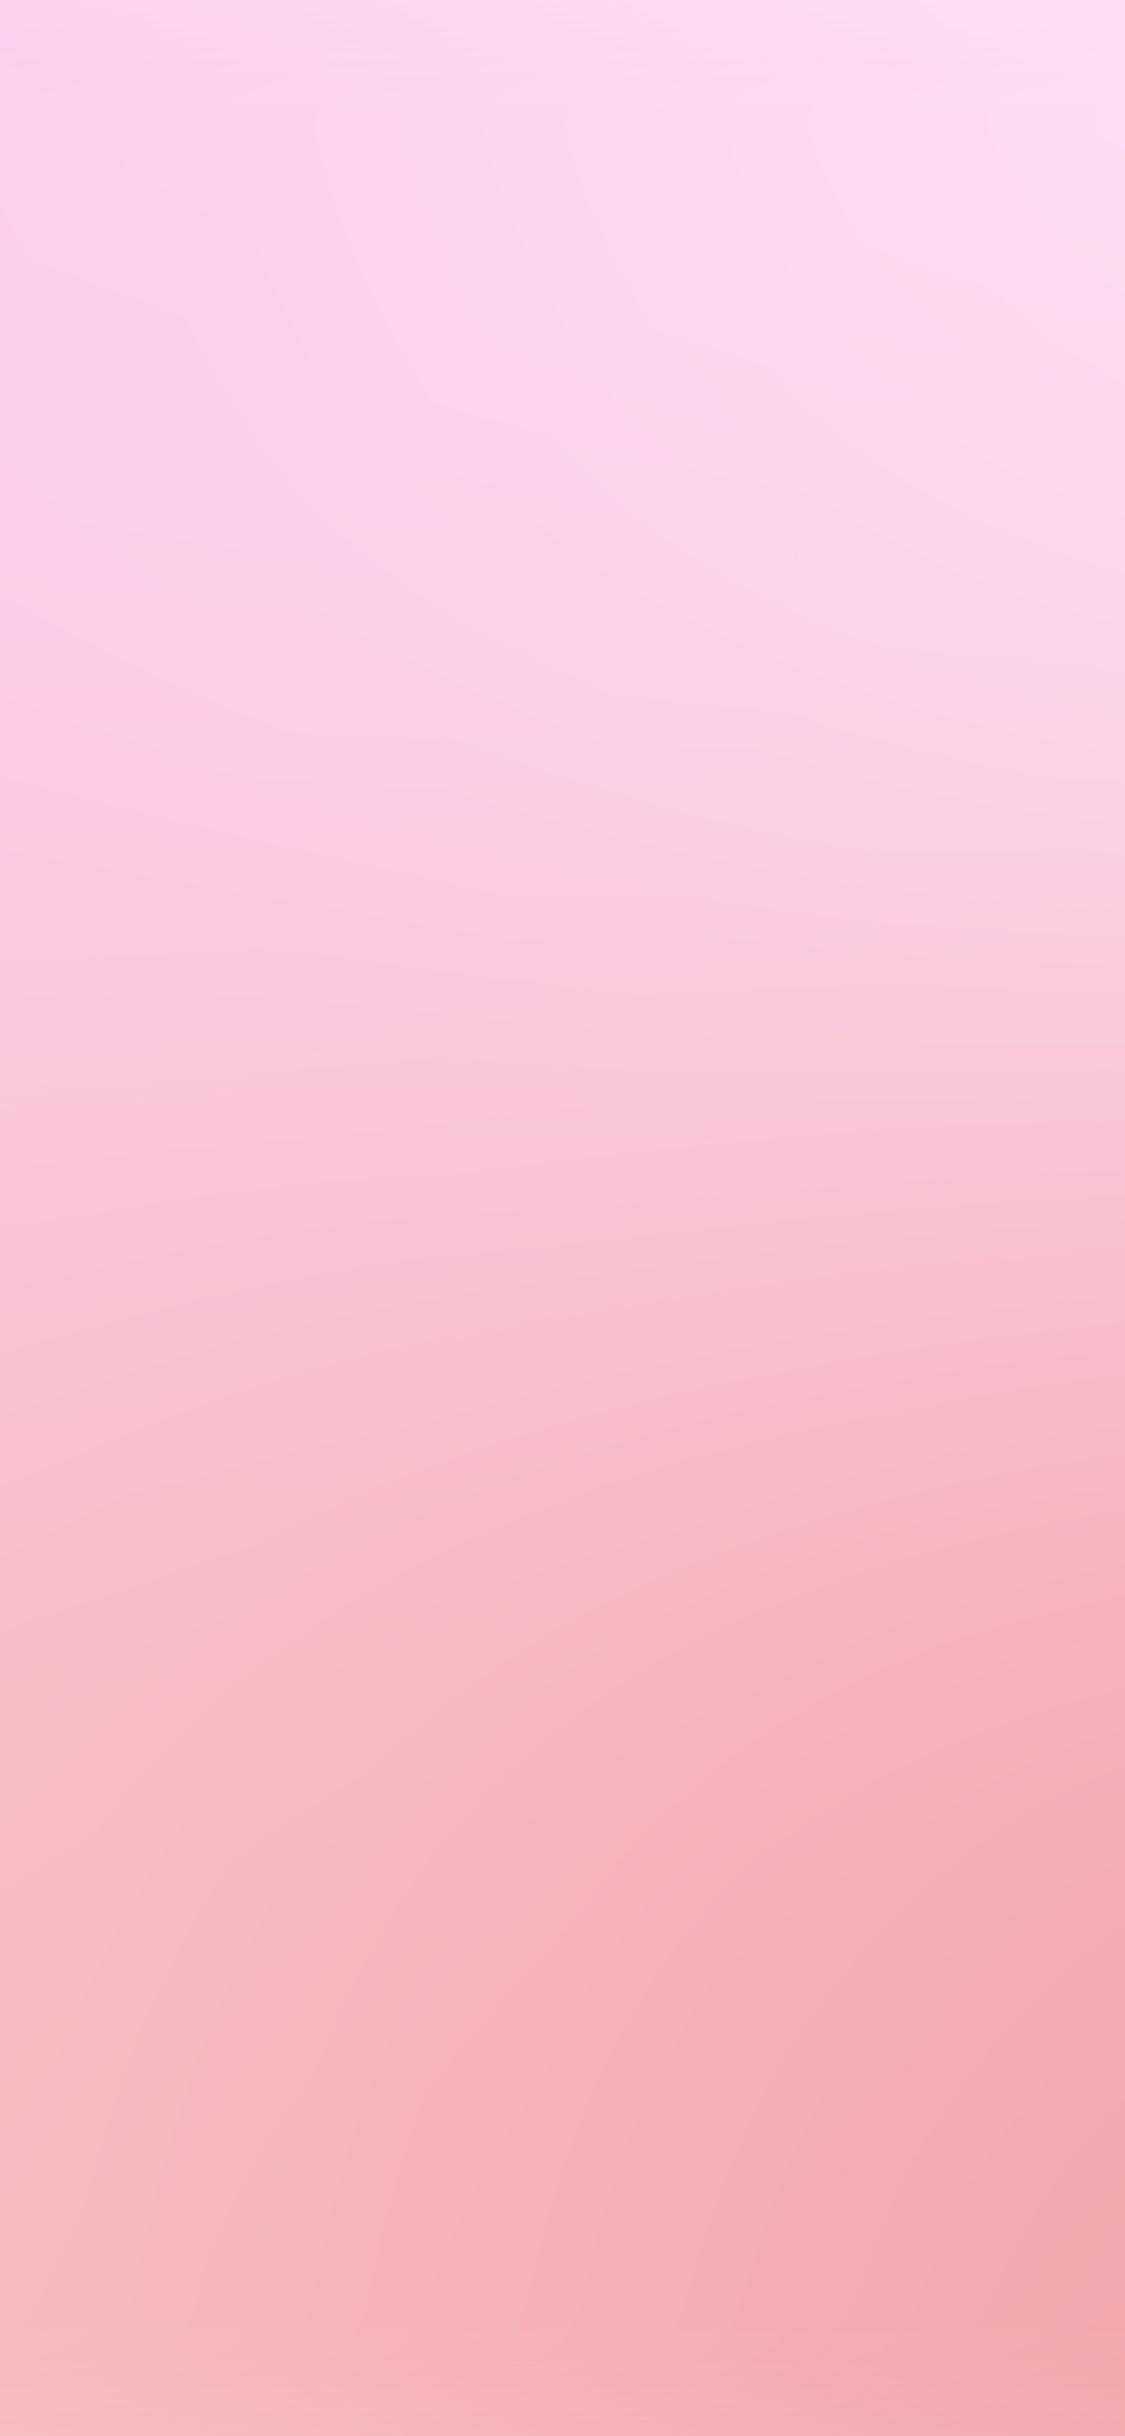 iPhoneXpapers.com-Apple-iPhone-wallpaper-sk59-pink-lovely-blur-gradation